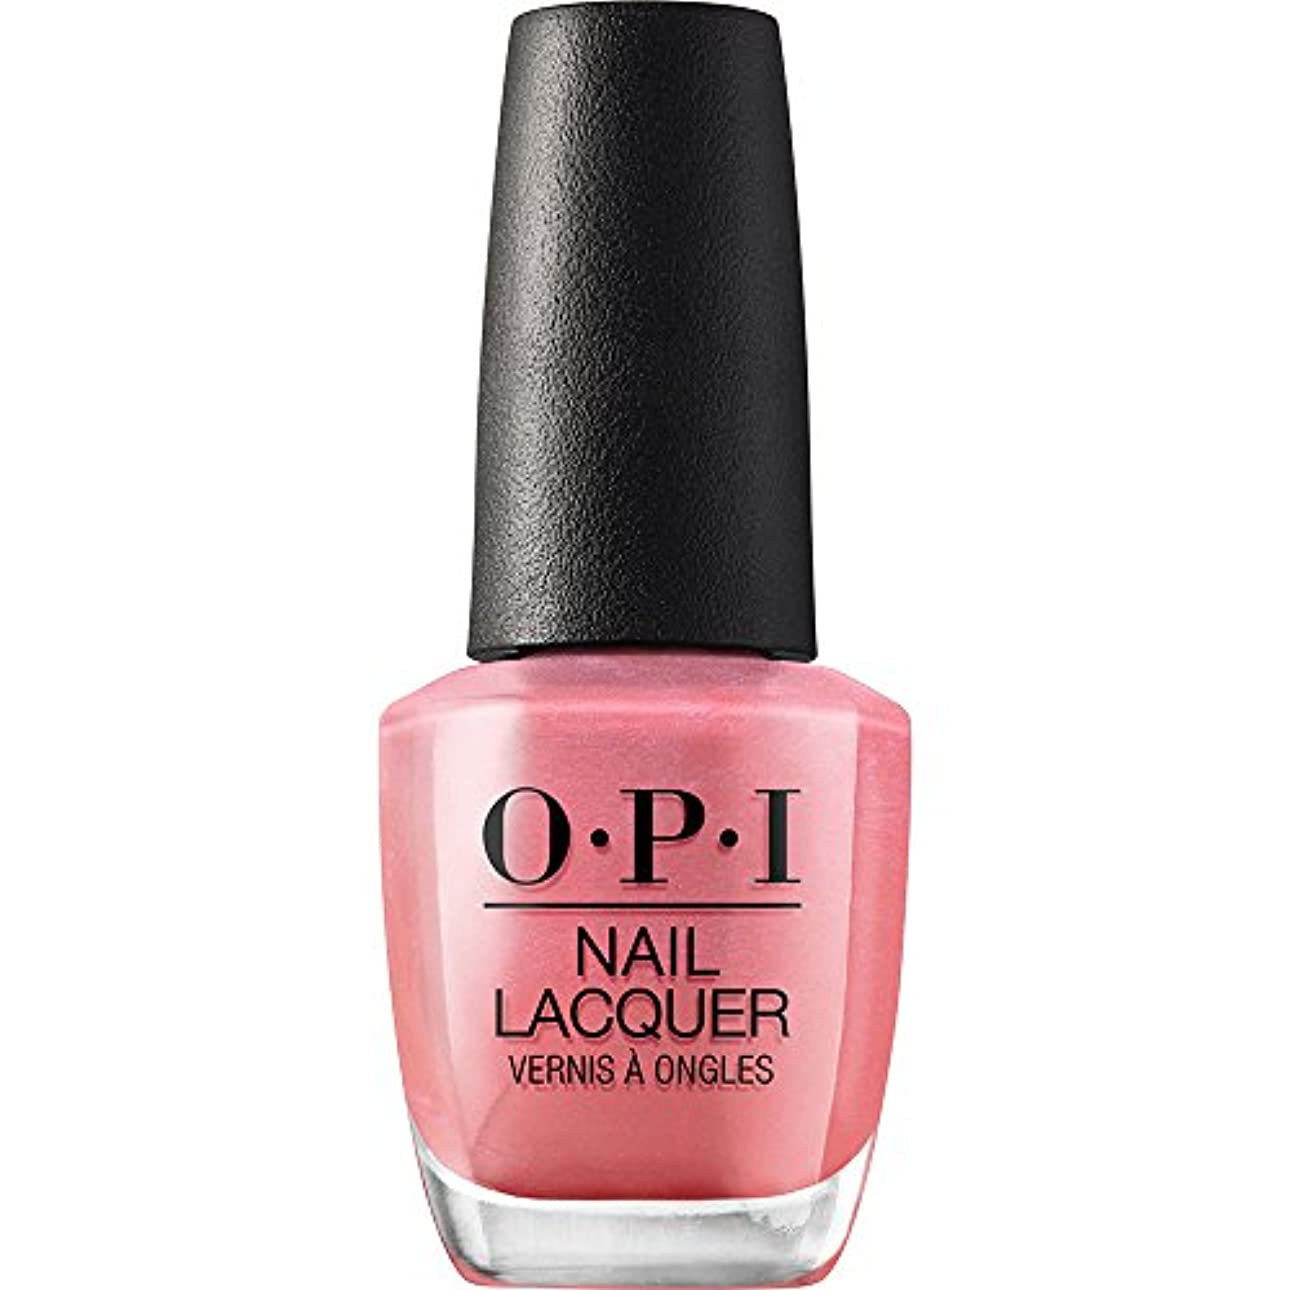 OPI(オーピーアイ) NLA06 ハワイアン オーキッド